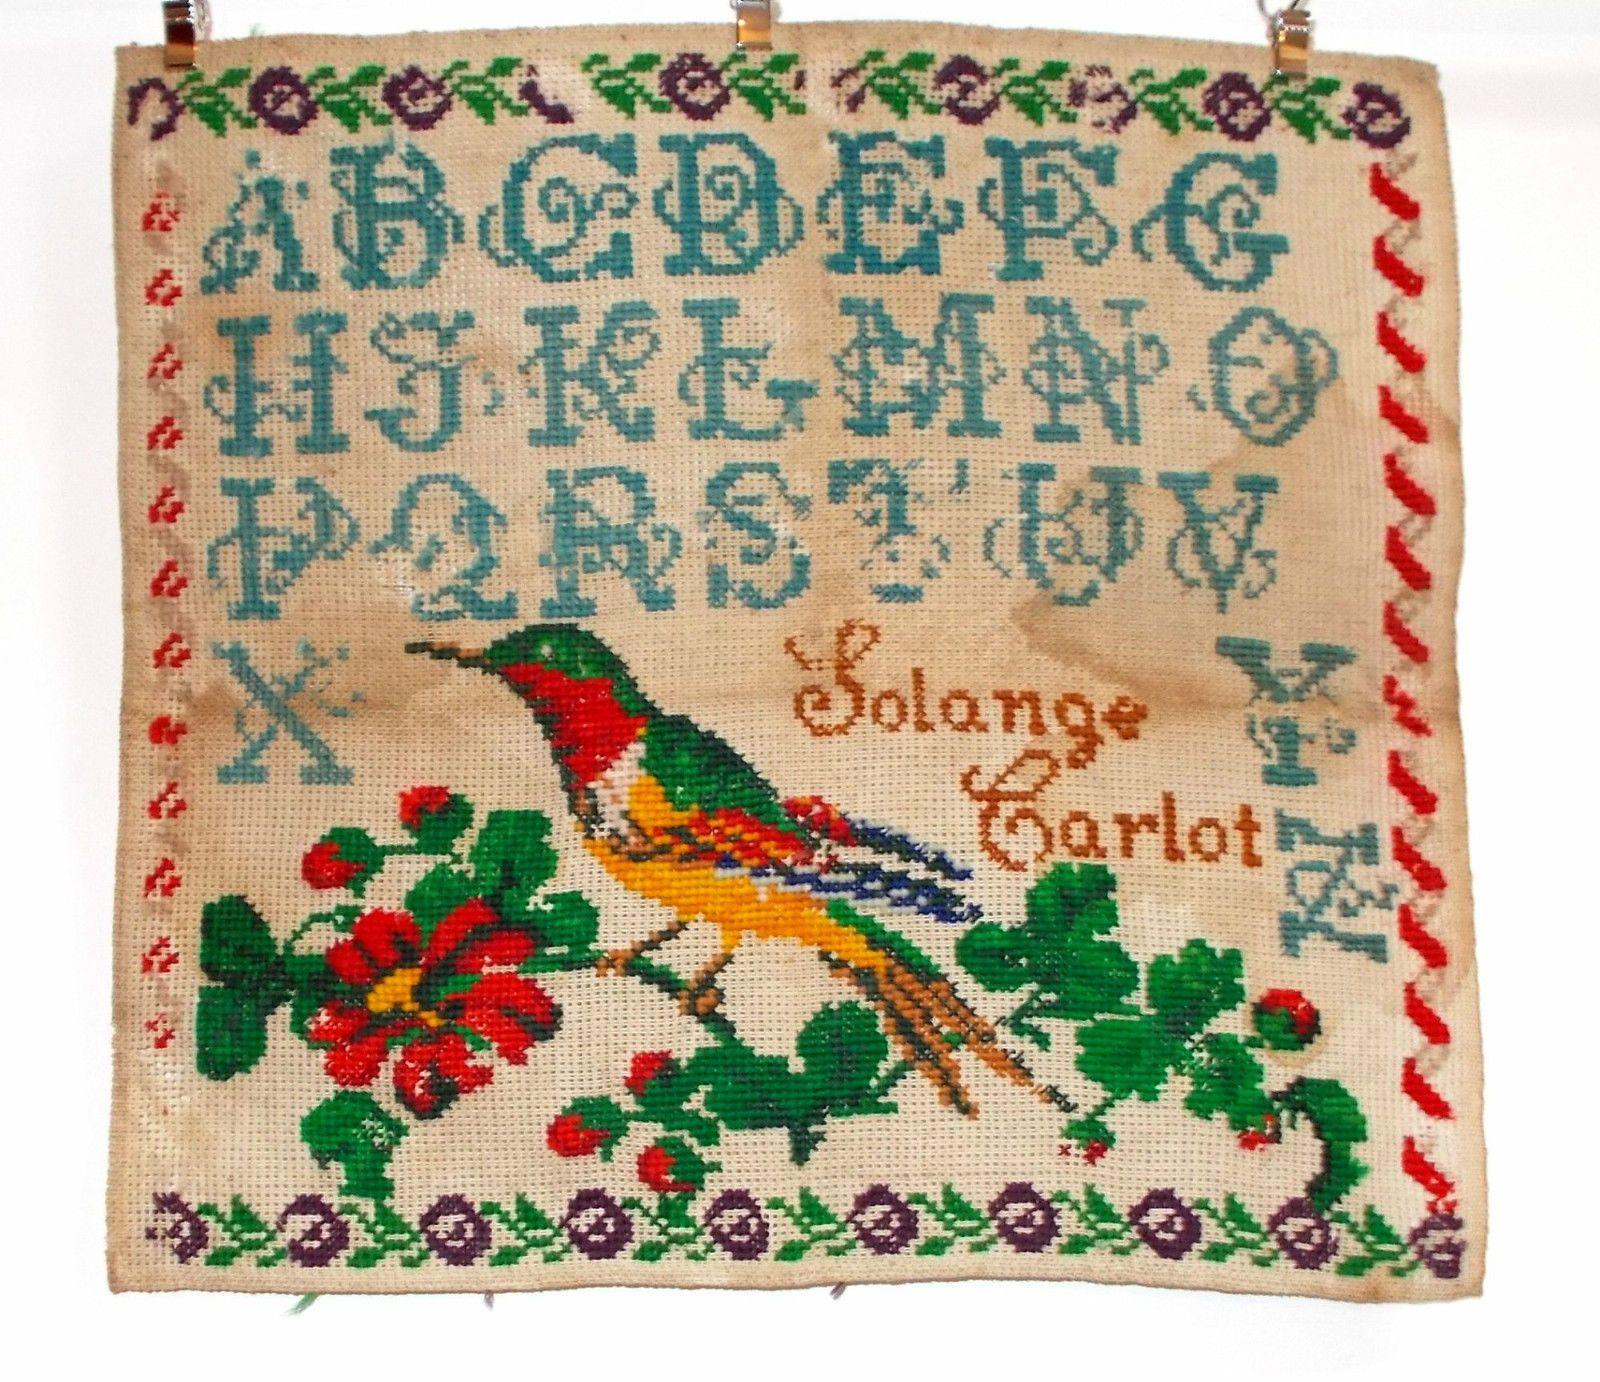 Th century french sampler stitched by solange carlot borduren